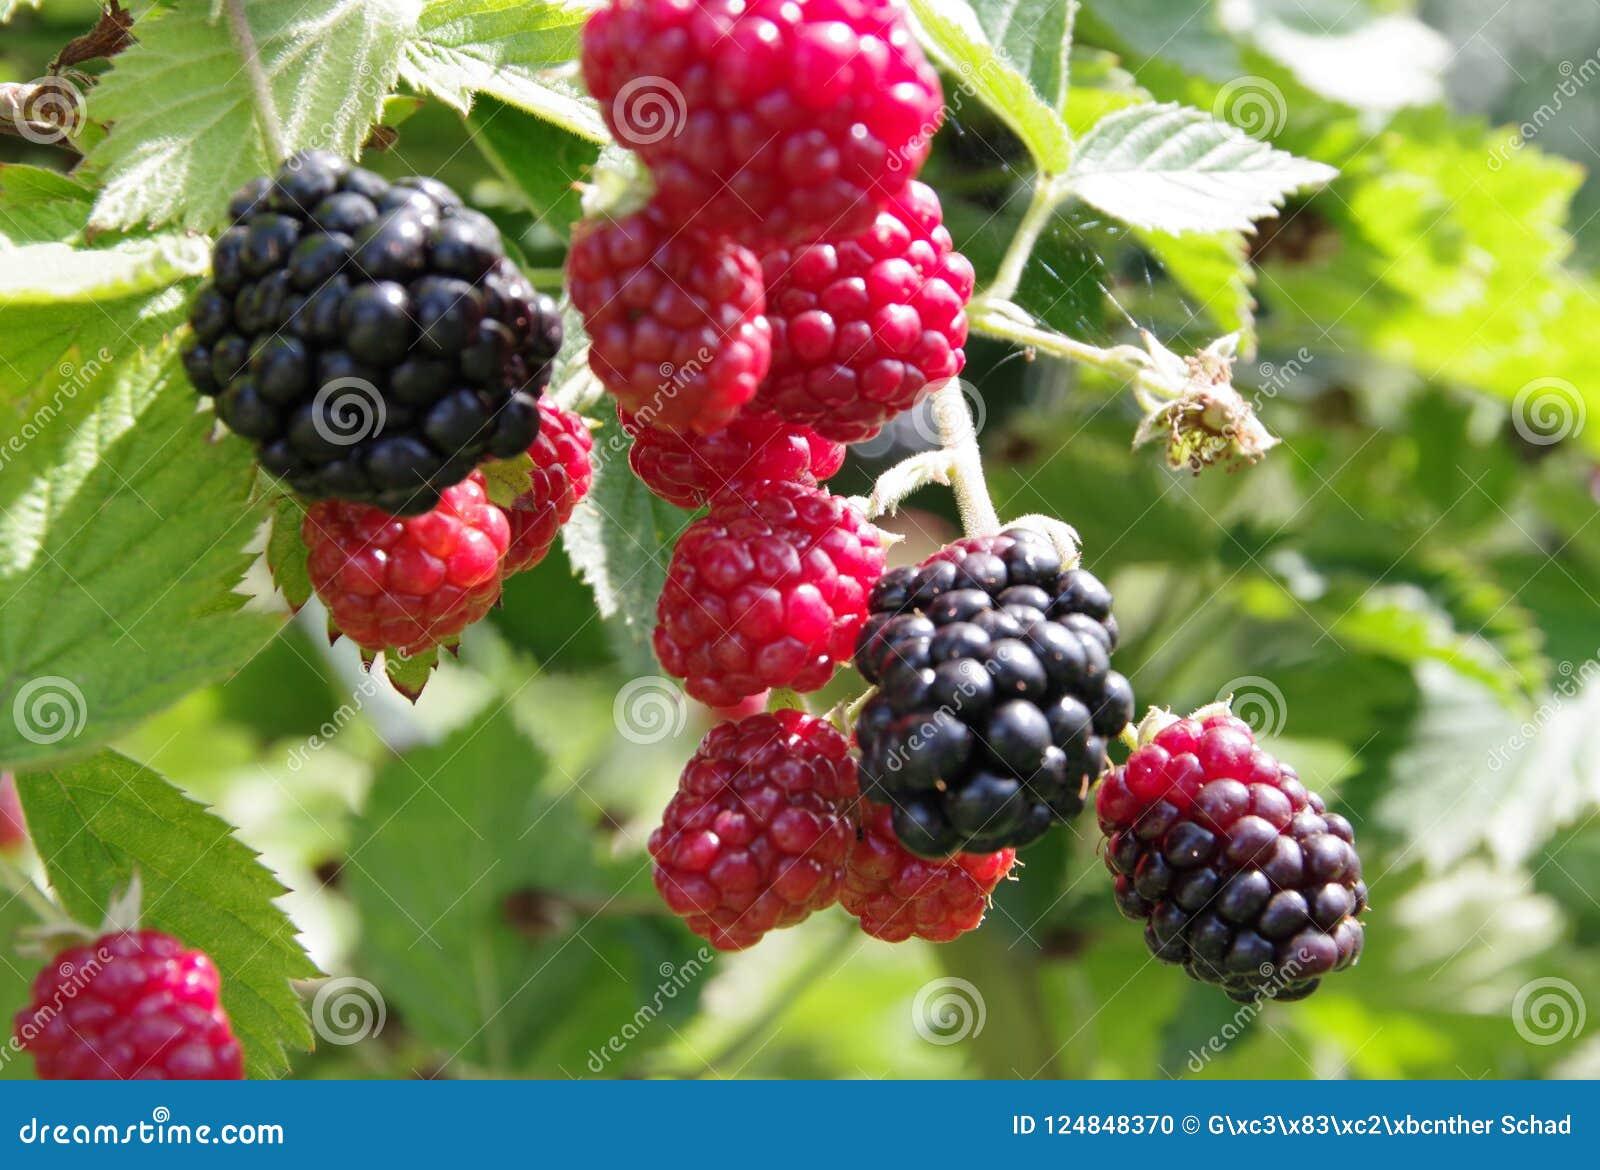 Wild blackberries in different states of maturity